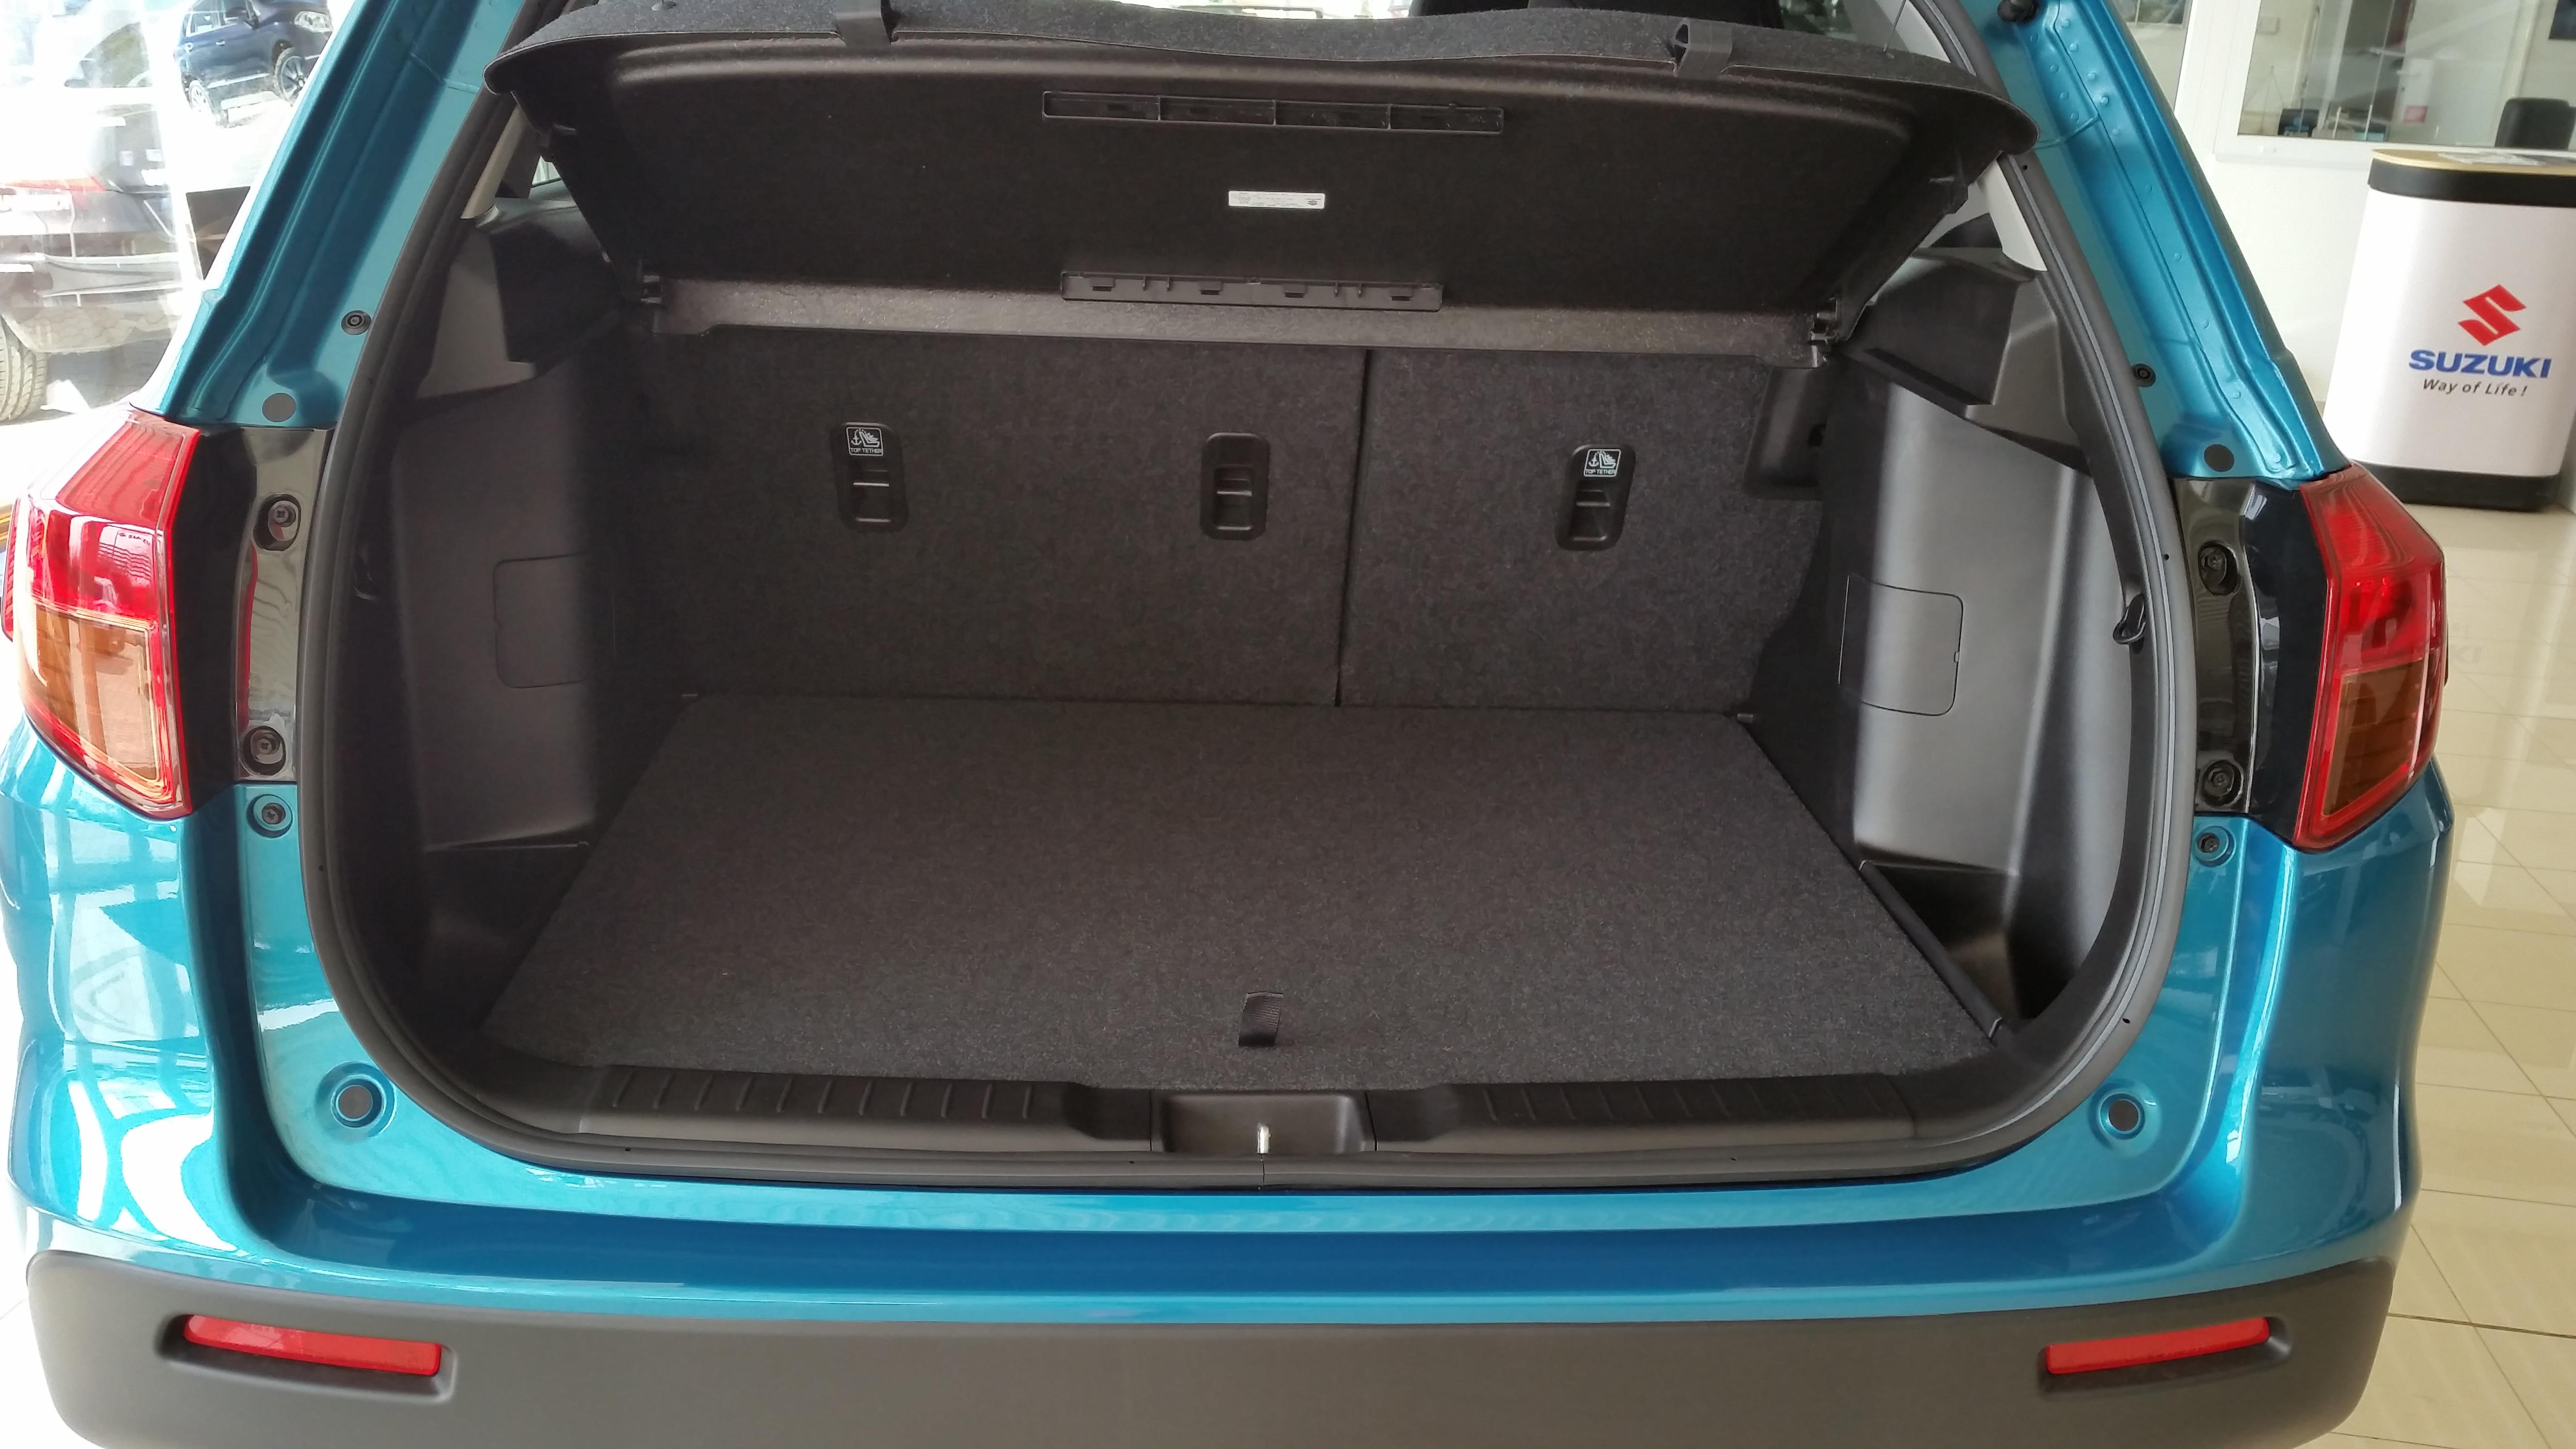 Suzuki Vitara kufr